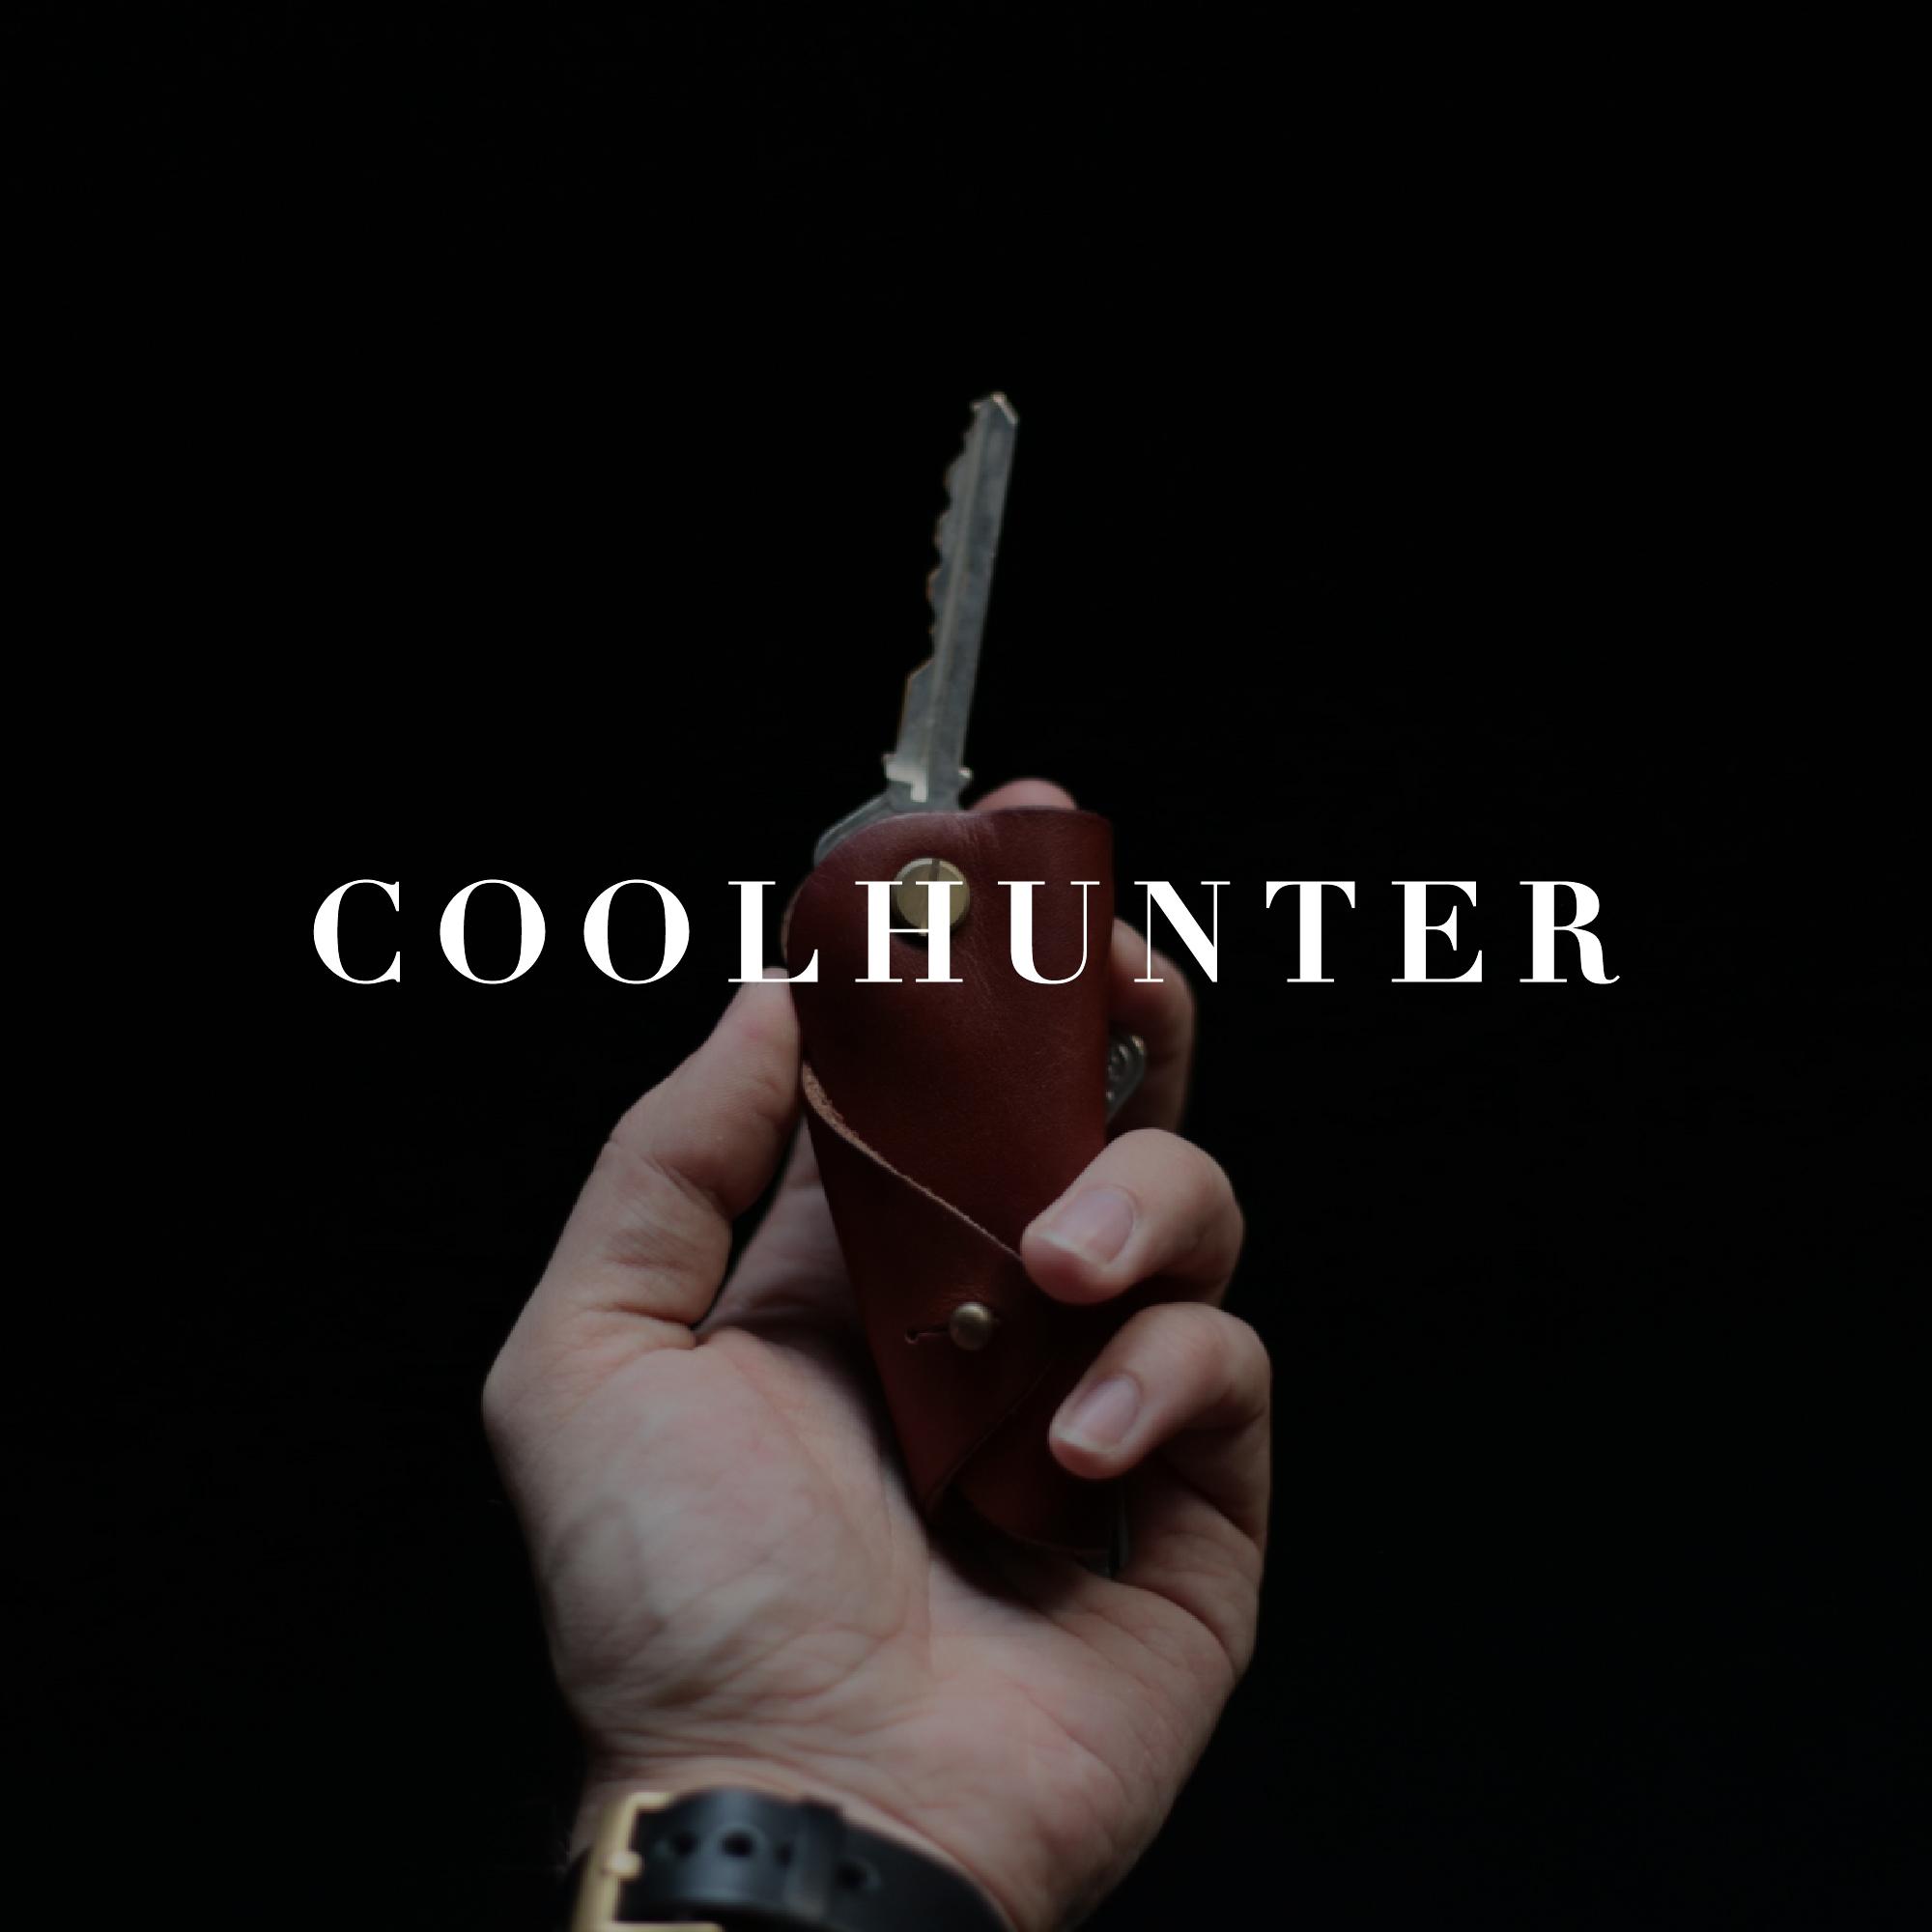 COOLHUNTER.jpg